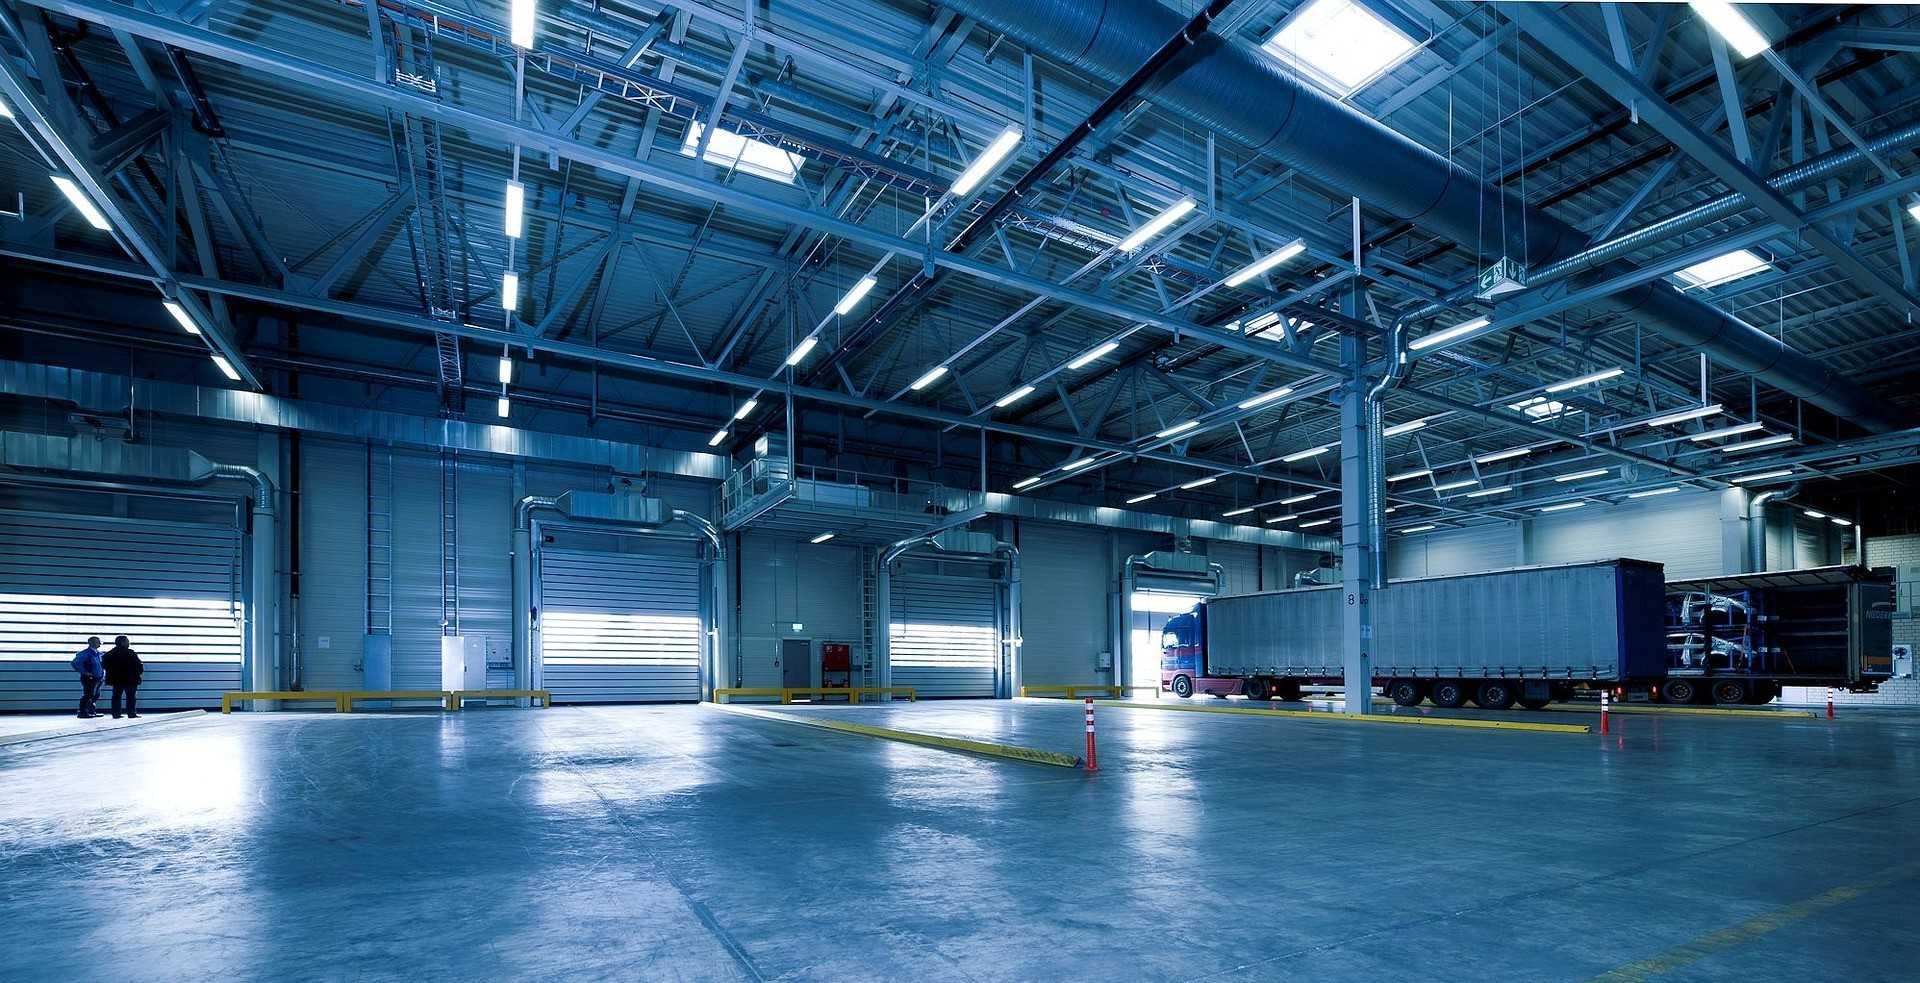 Summarize warehousing practices